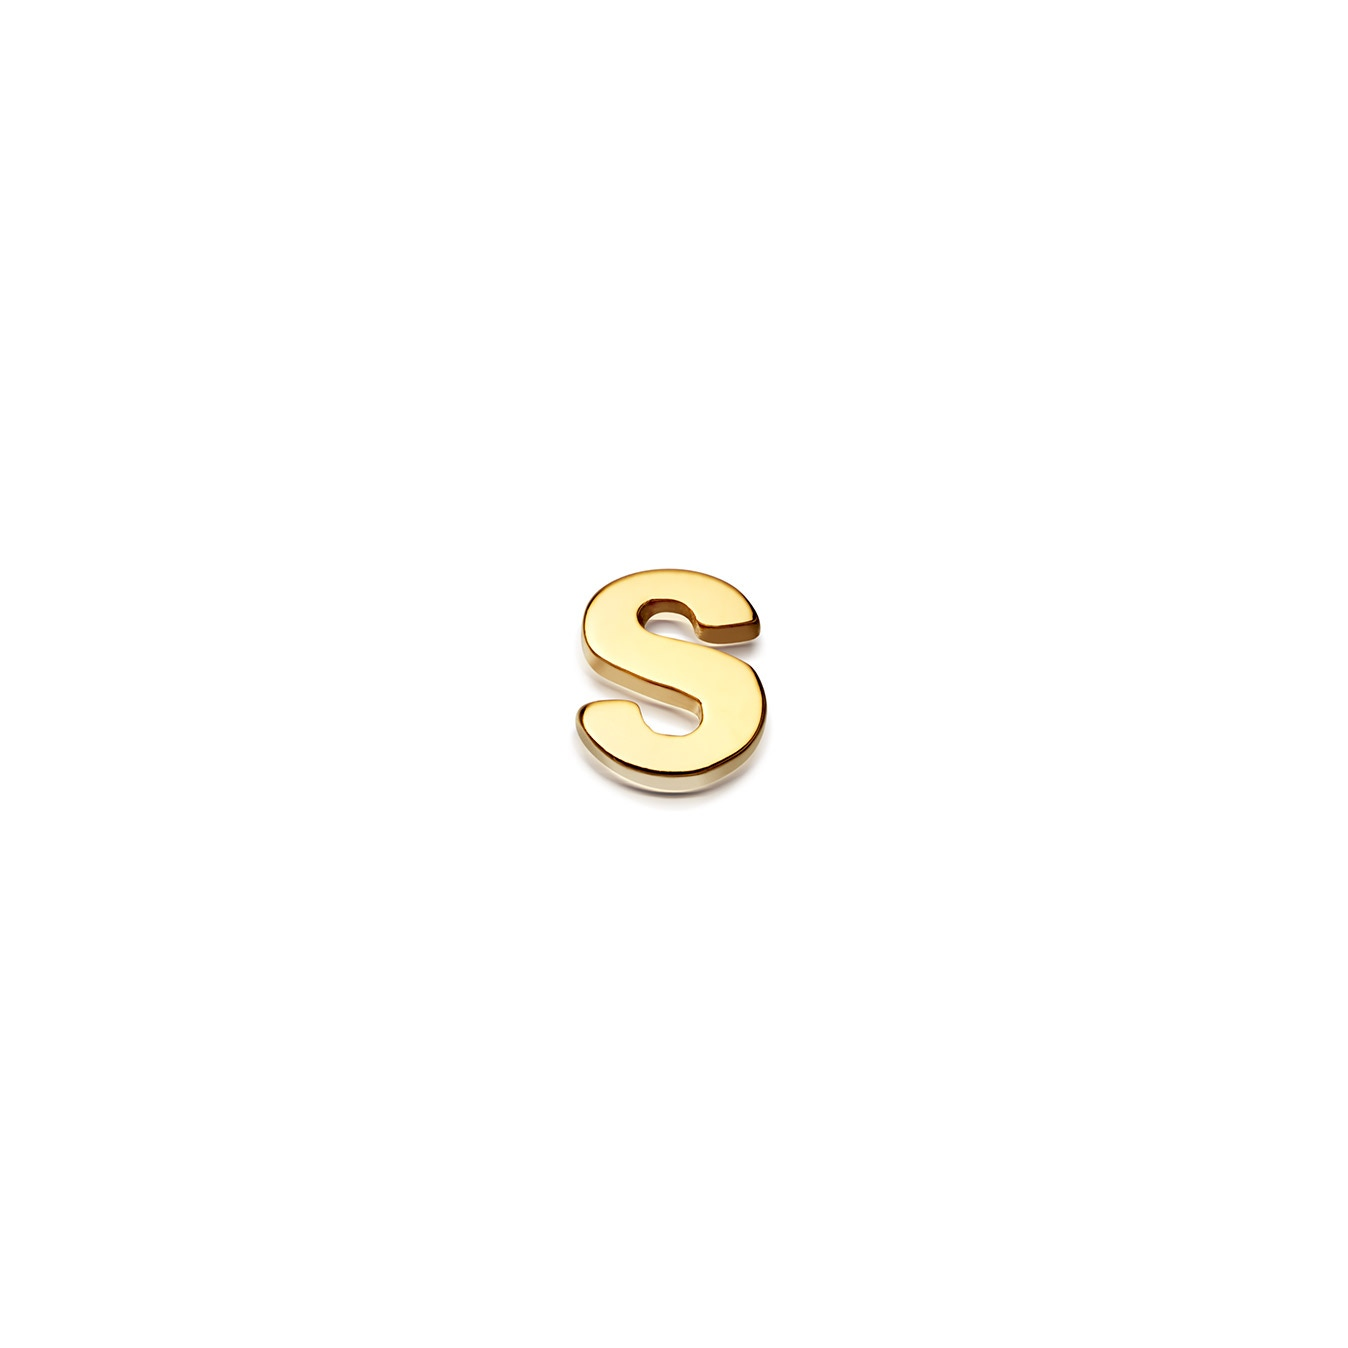 Initial 'S' Biography Pin